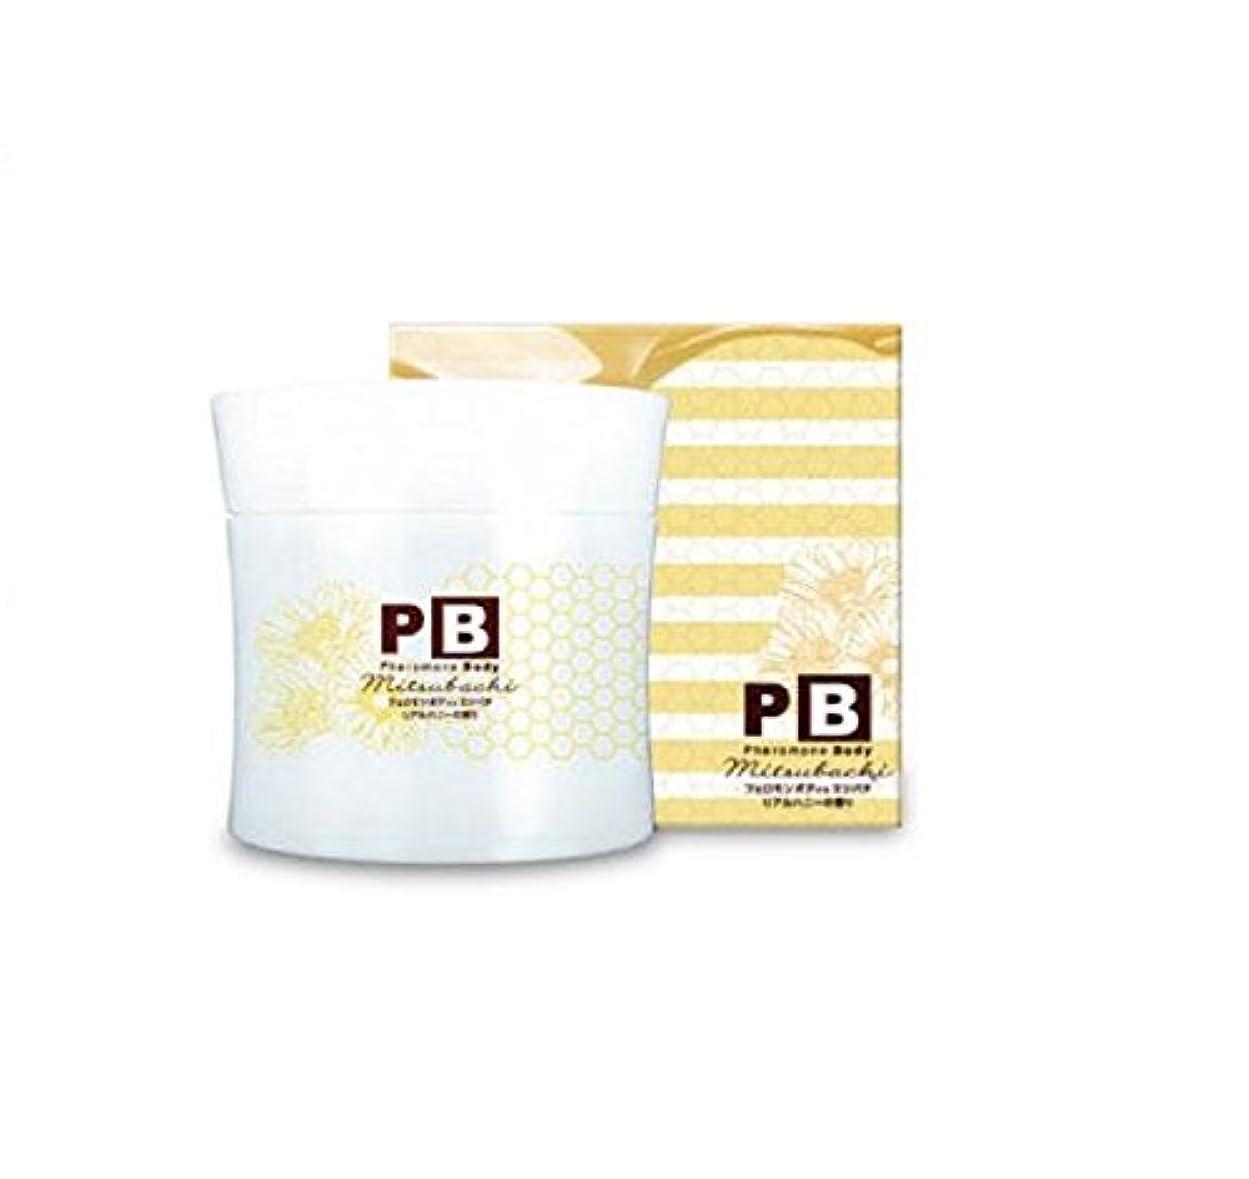 Pheromone body(フェロモンボディ)® ミツバチ 500g